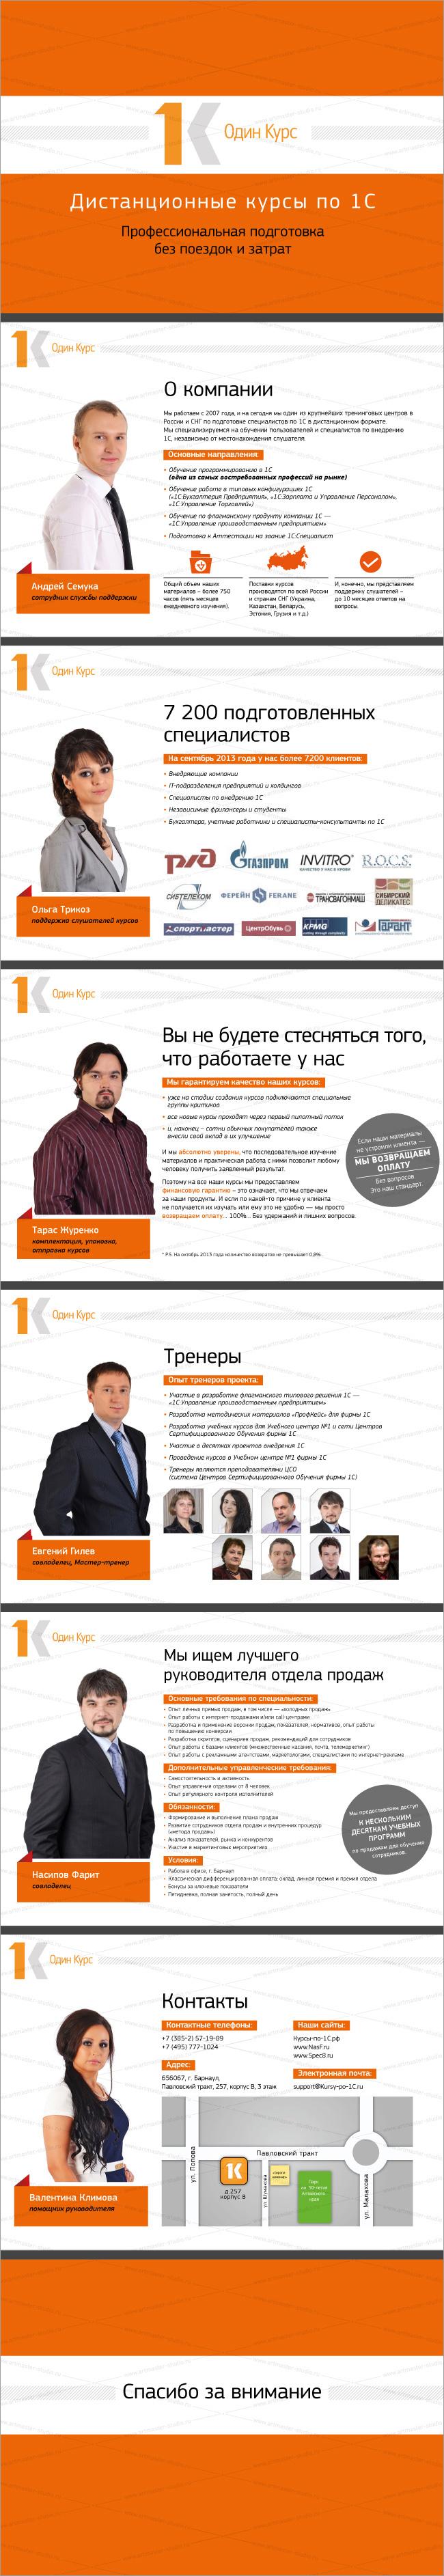 1C_presentation